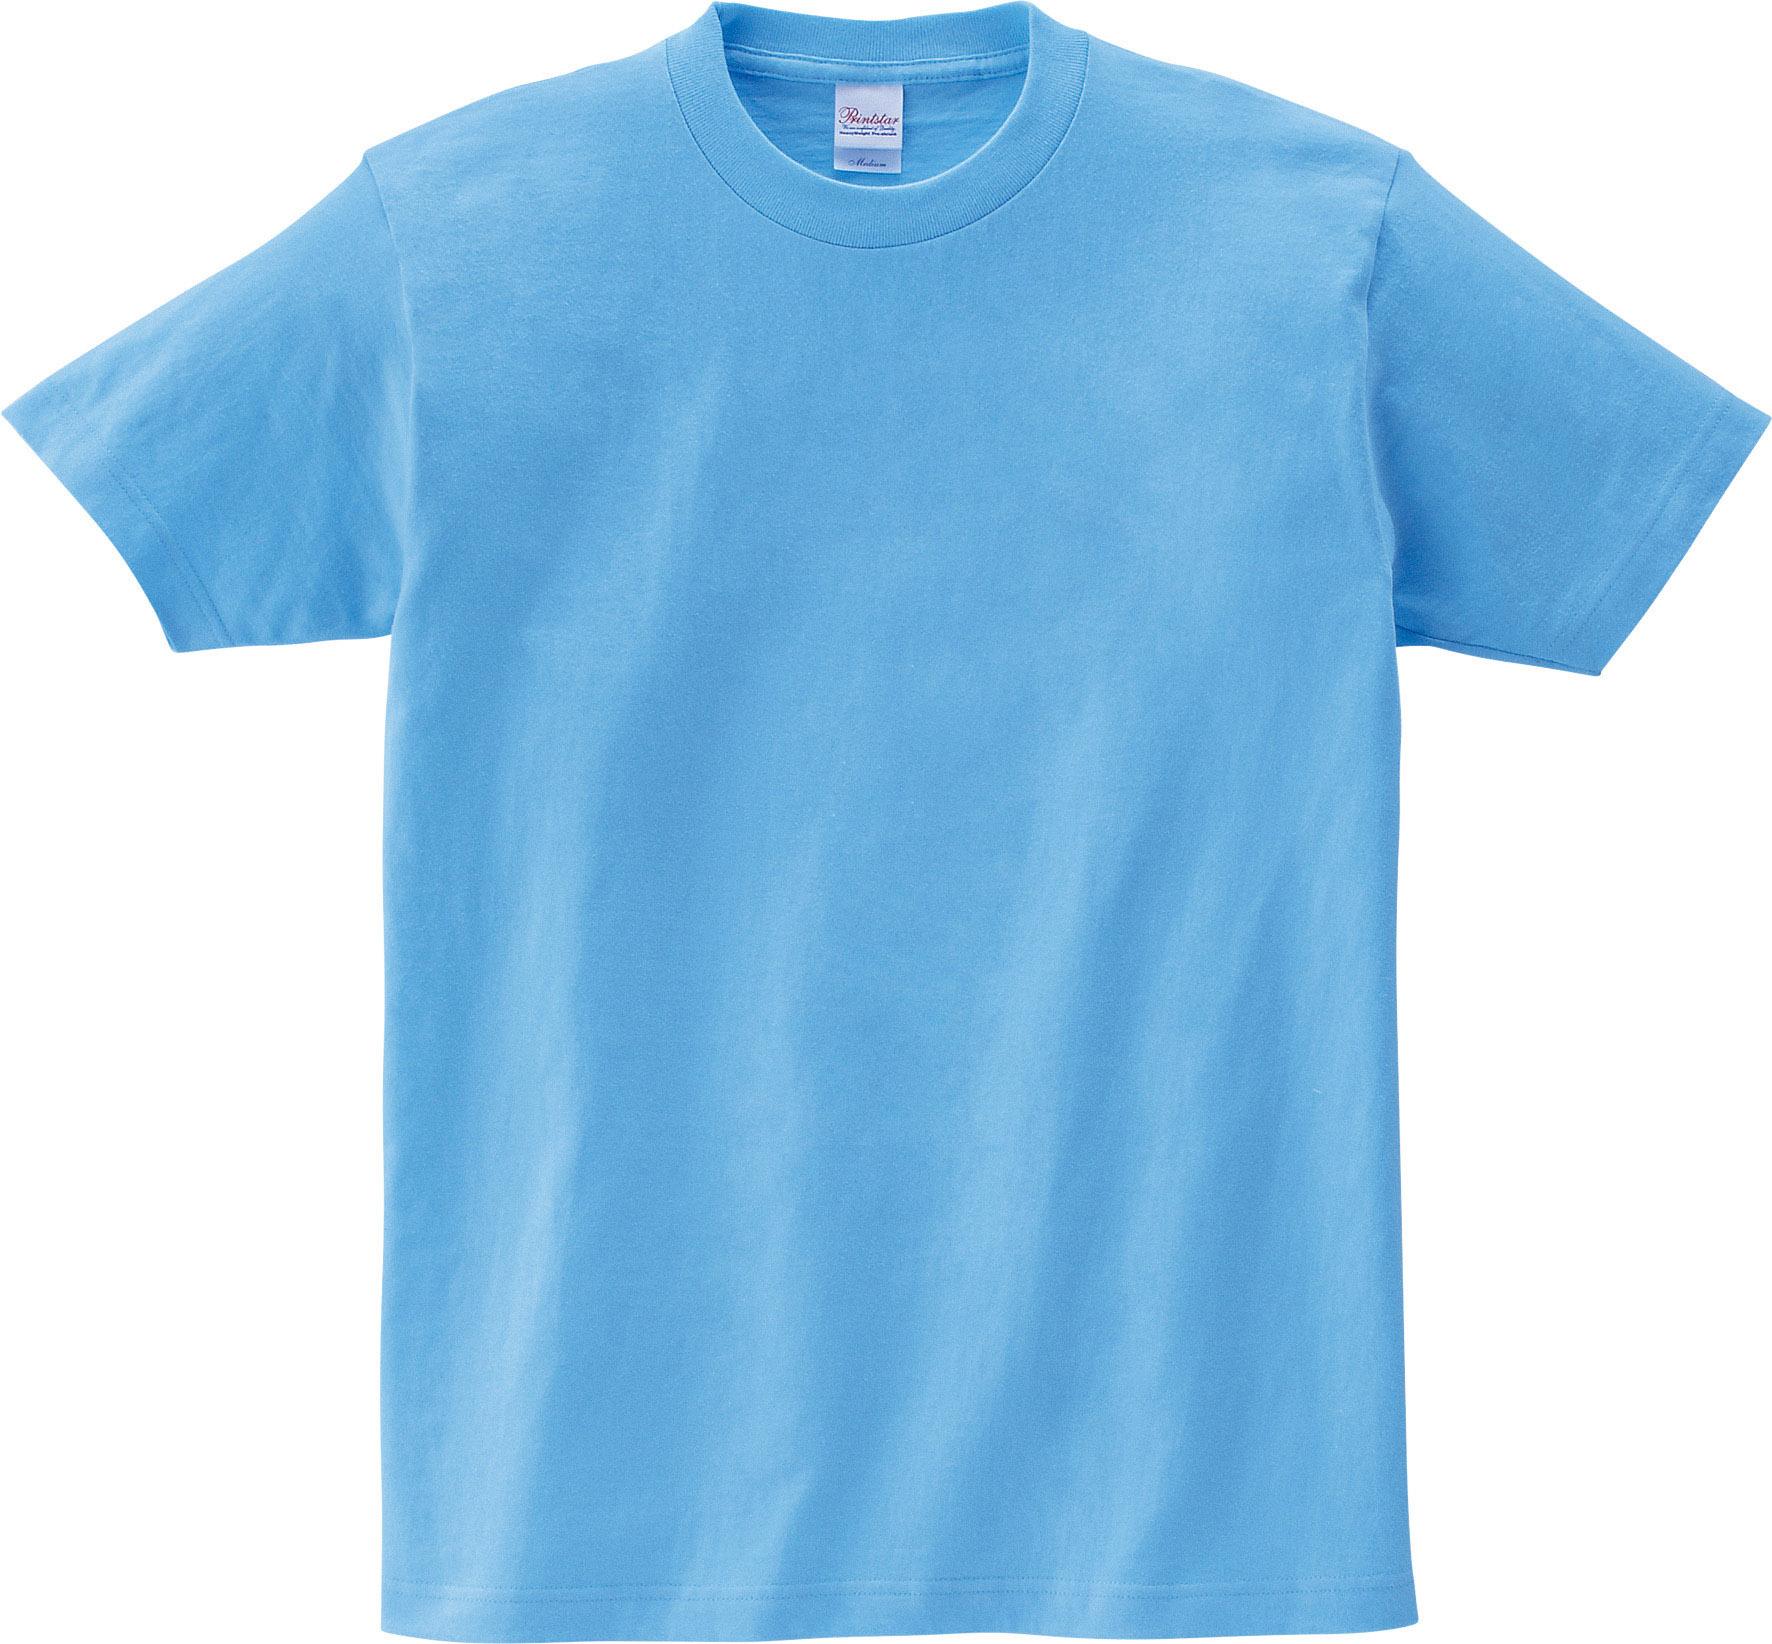 00085-CVT 5.6オンス・ヘビーウェイトTシャツ - 033-サックス, XXXL